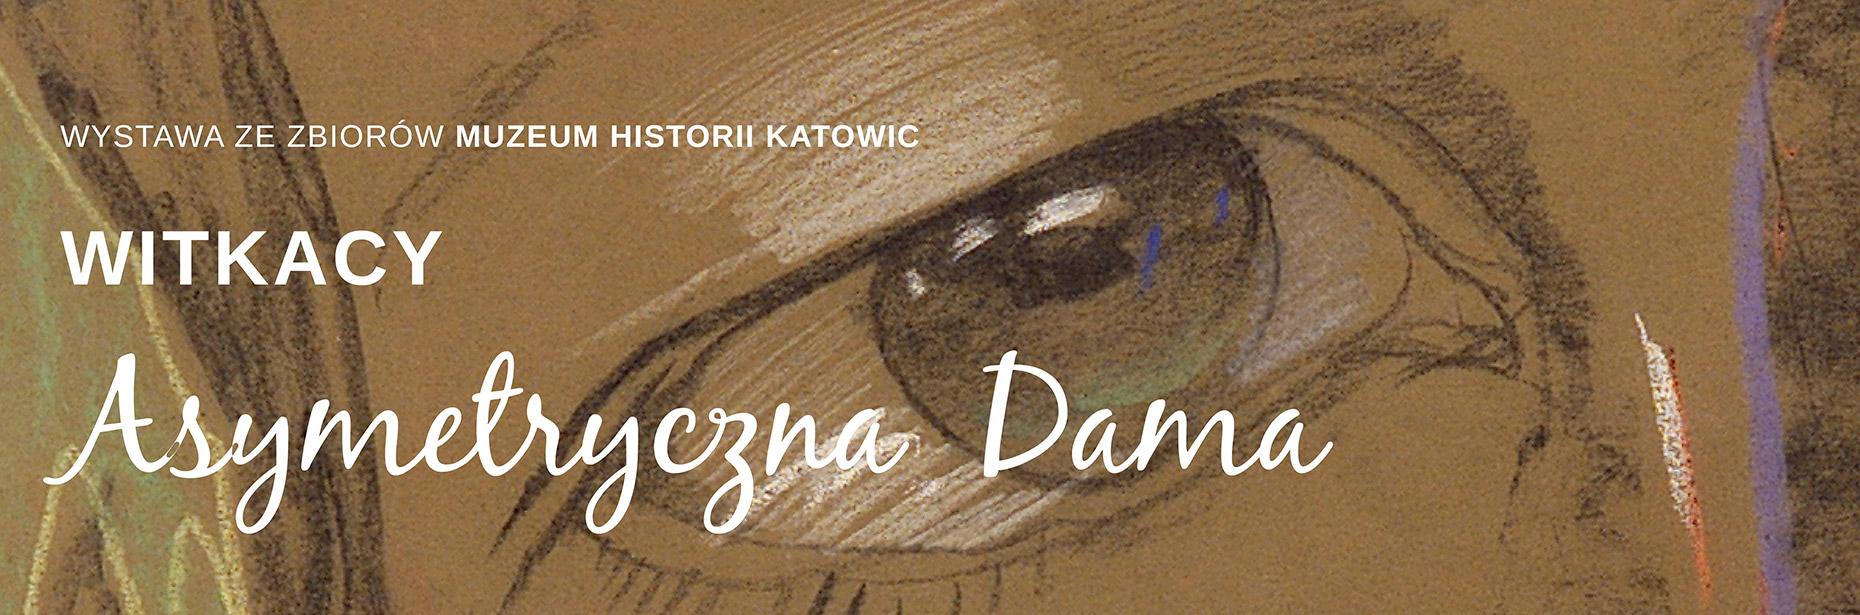 Muzeum Historii Katowic